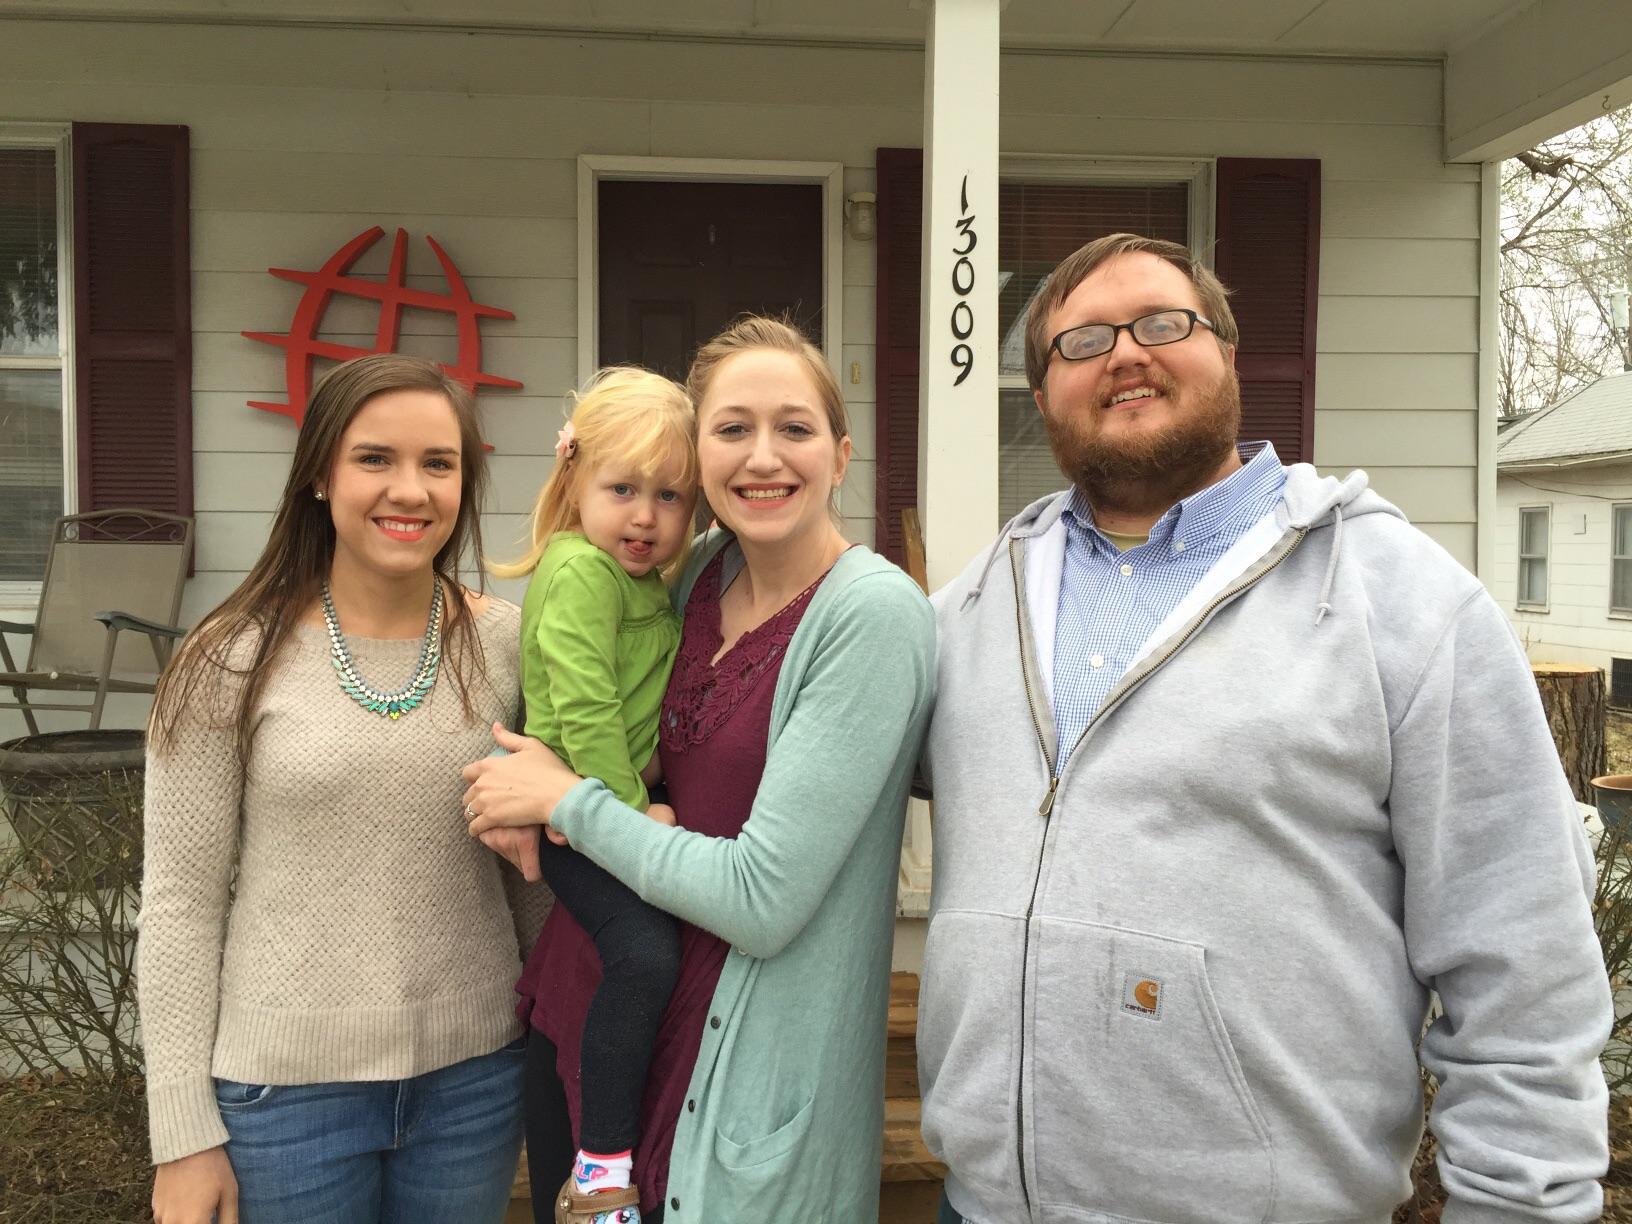 Hannah and the Joneses